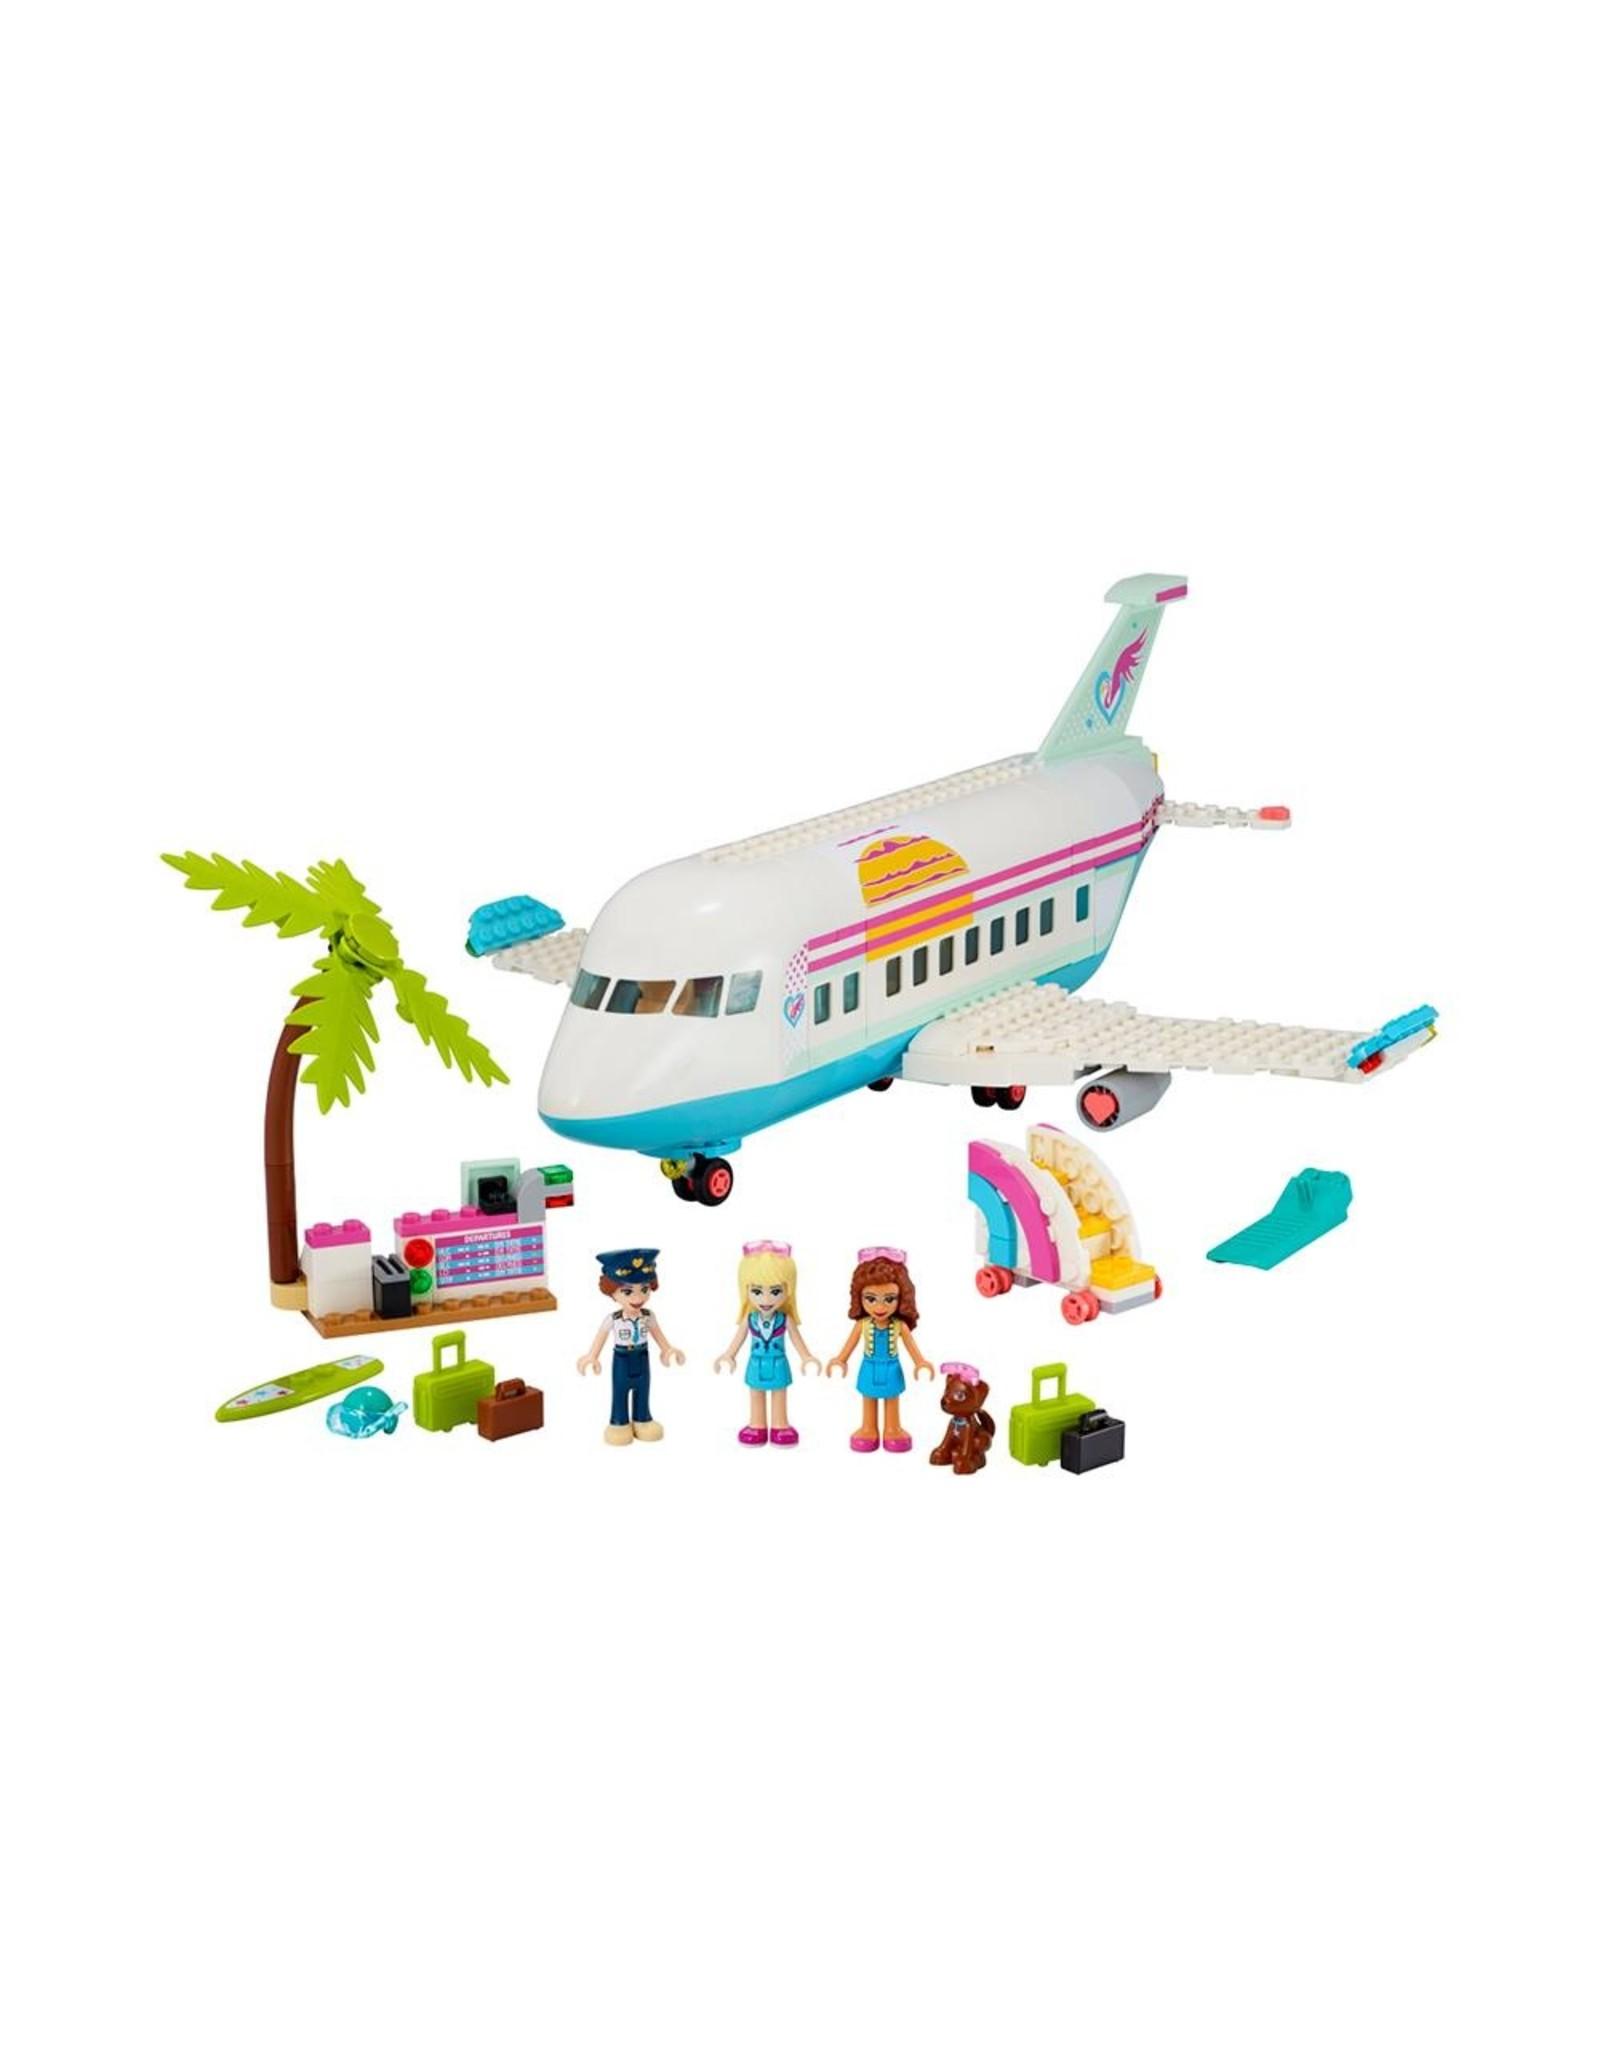 LEGO Friends - 41429 - Heartlake City Airplane